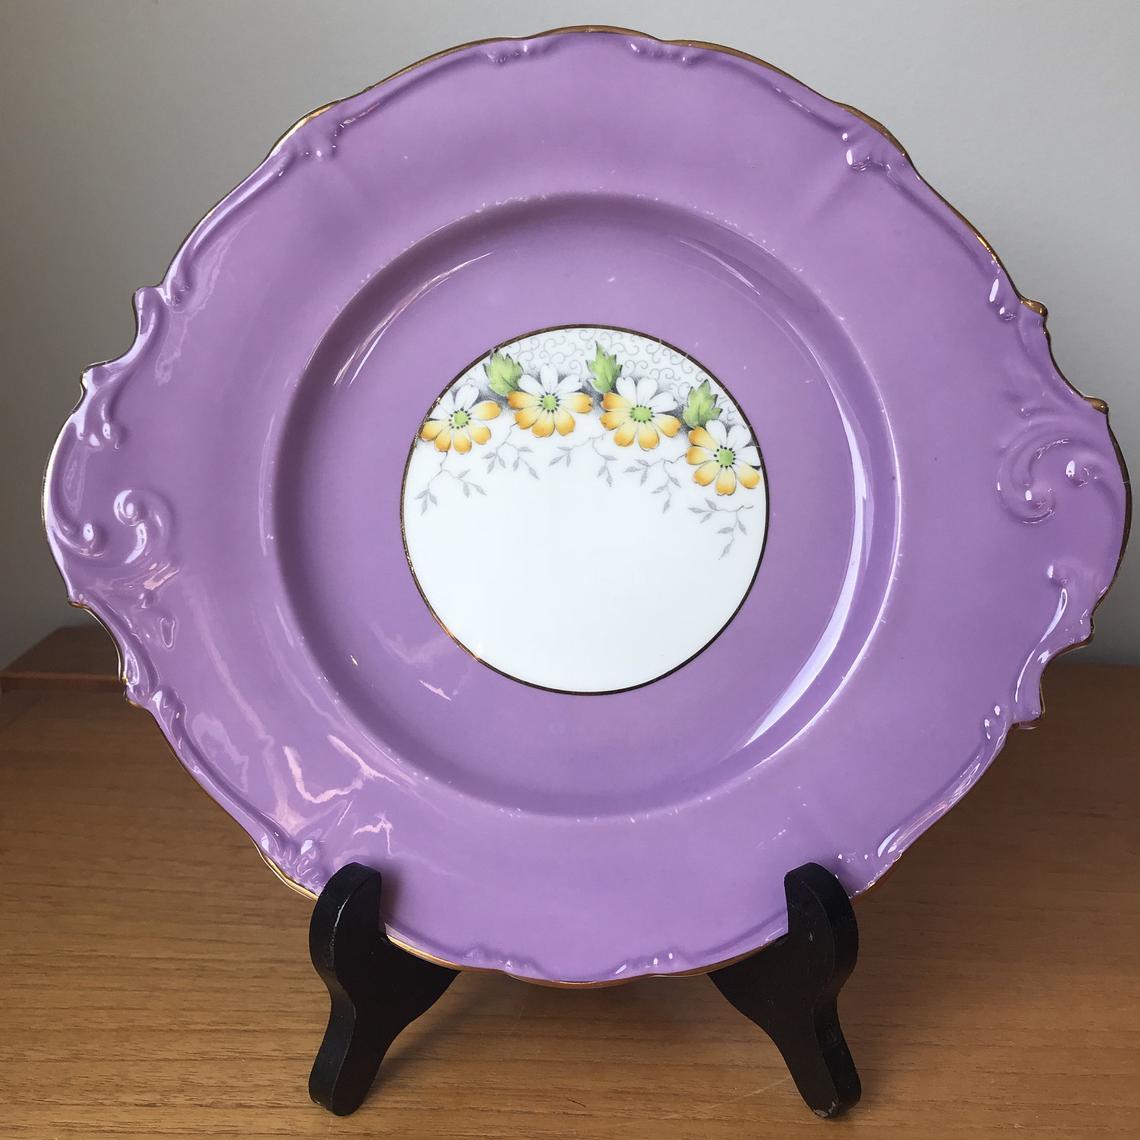 Paragon Margot Purple Serving Tray, Bone China Yellow Floral Vintage Tray, Embossed Swirl Tab Handles